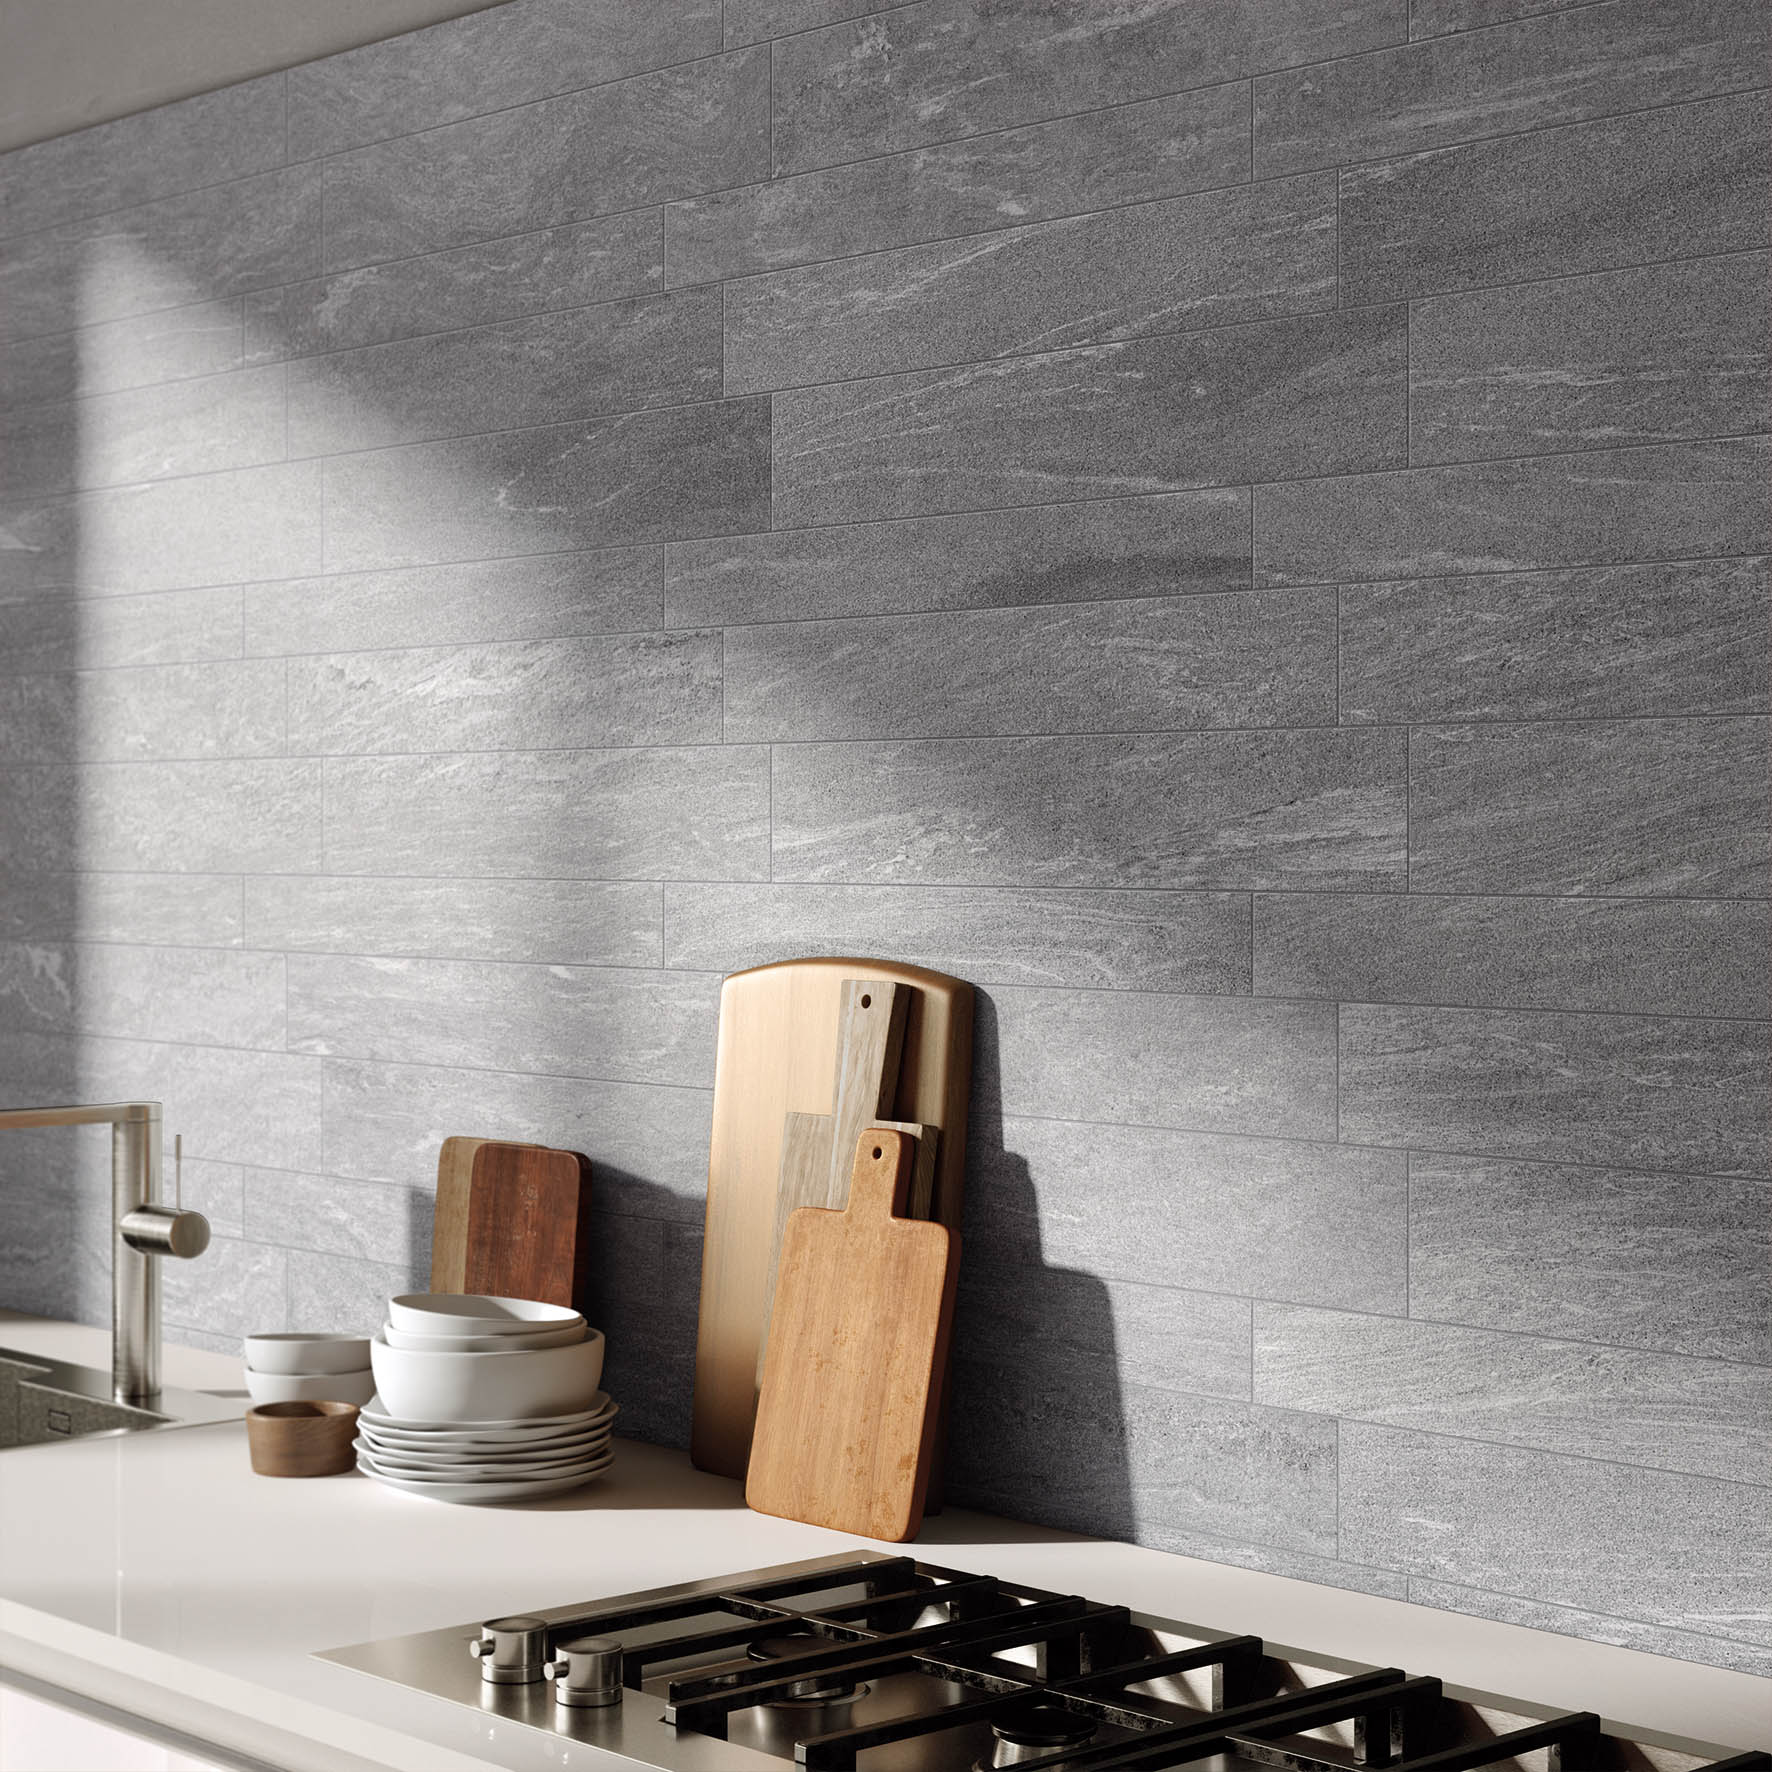 Pavimento rivestimento in gres porcellanato stonework for Rivestimento cucina